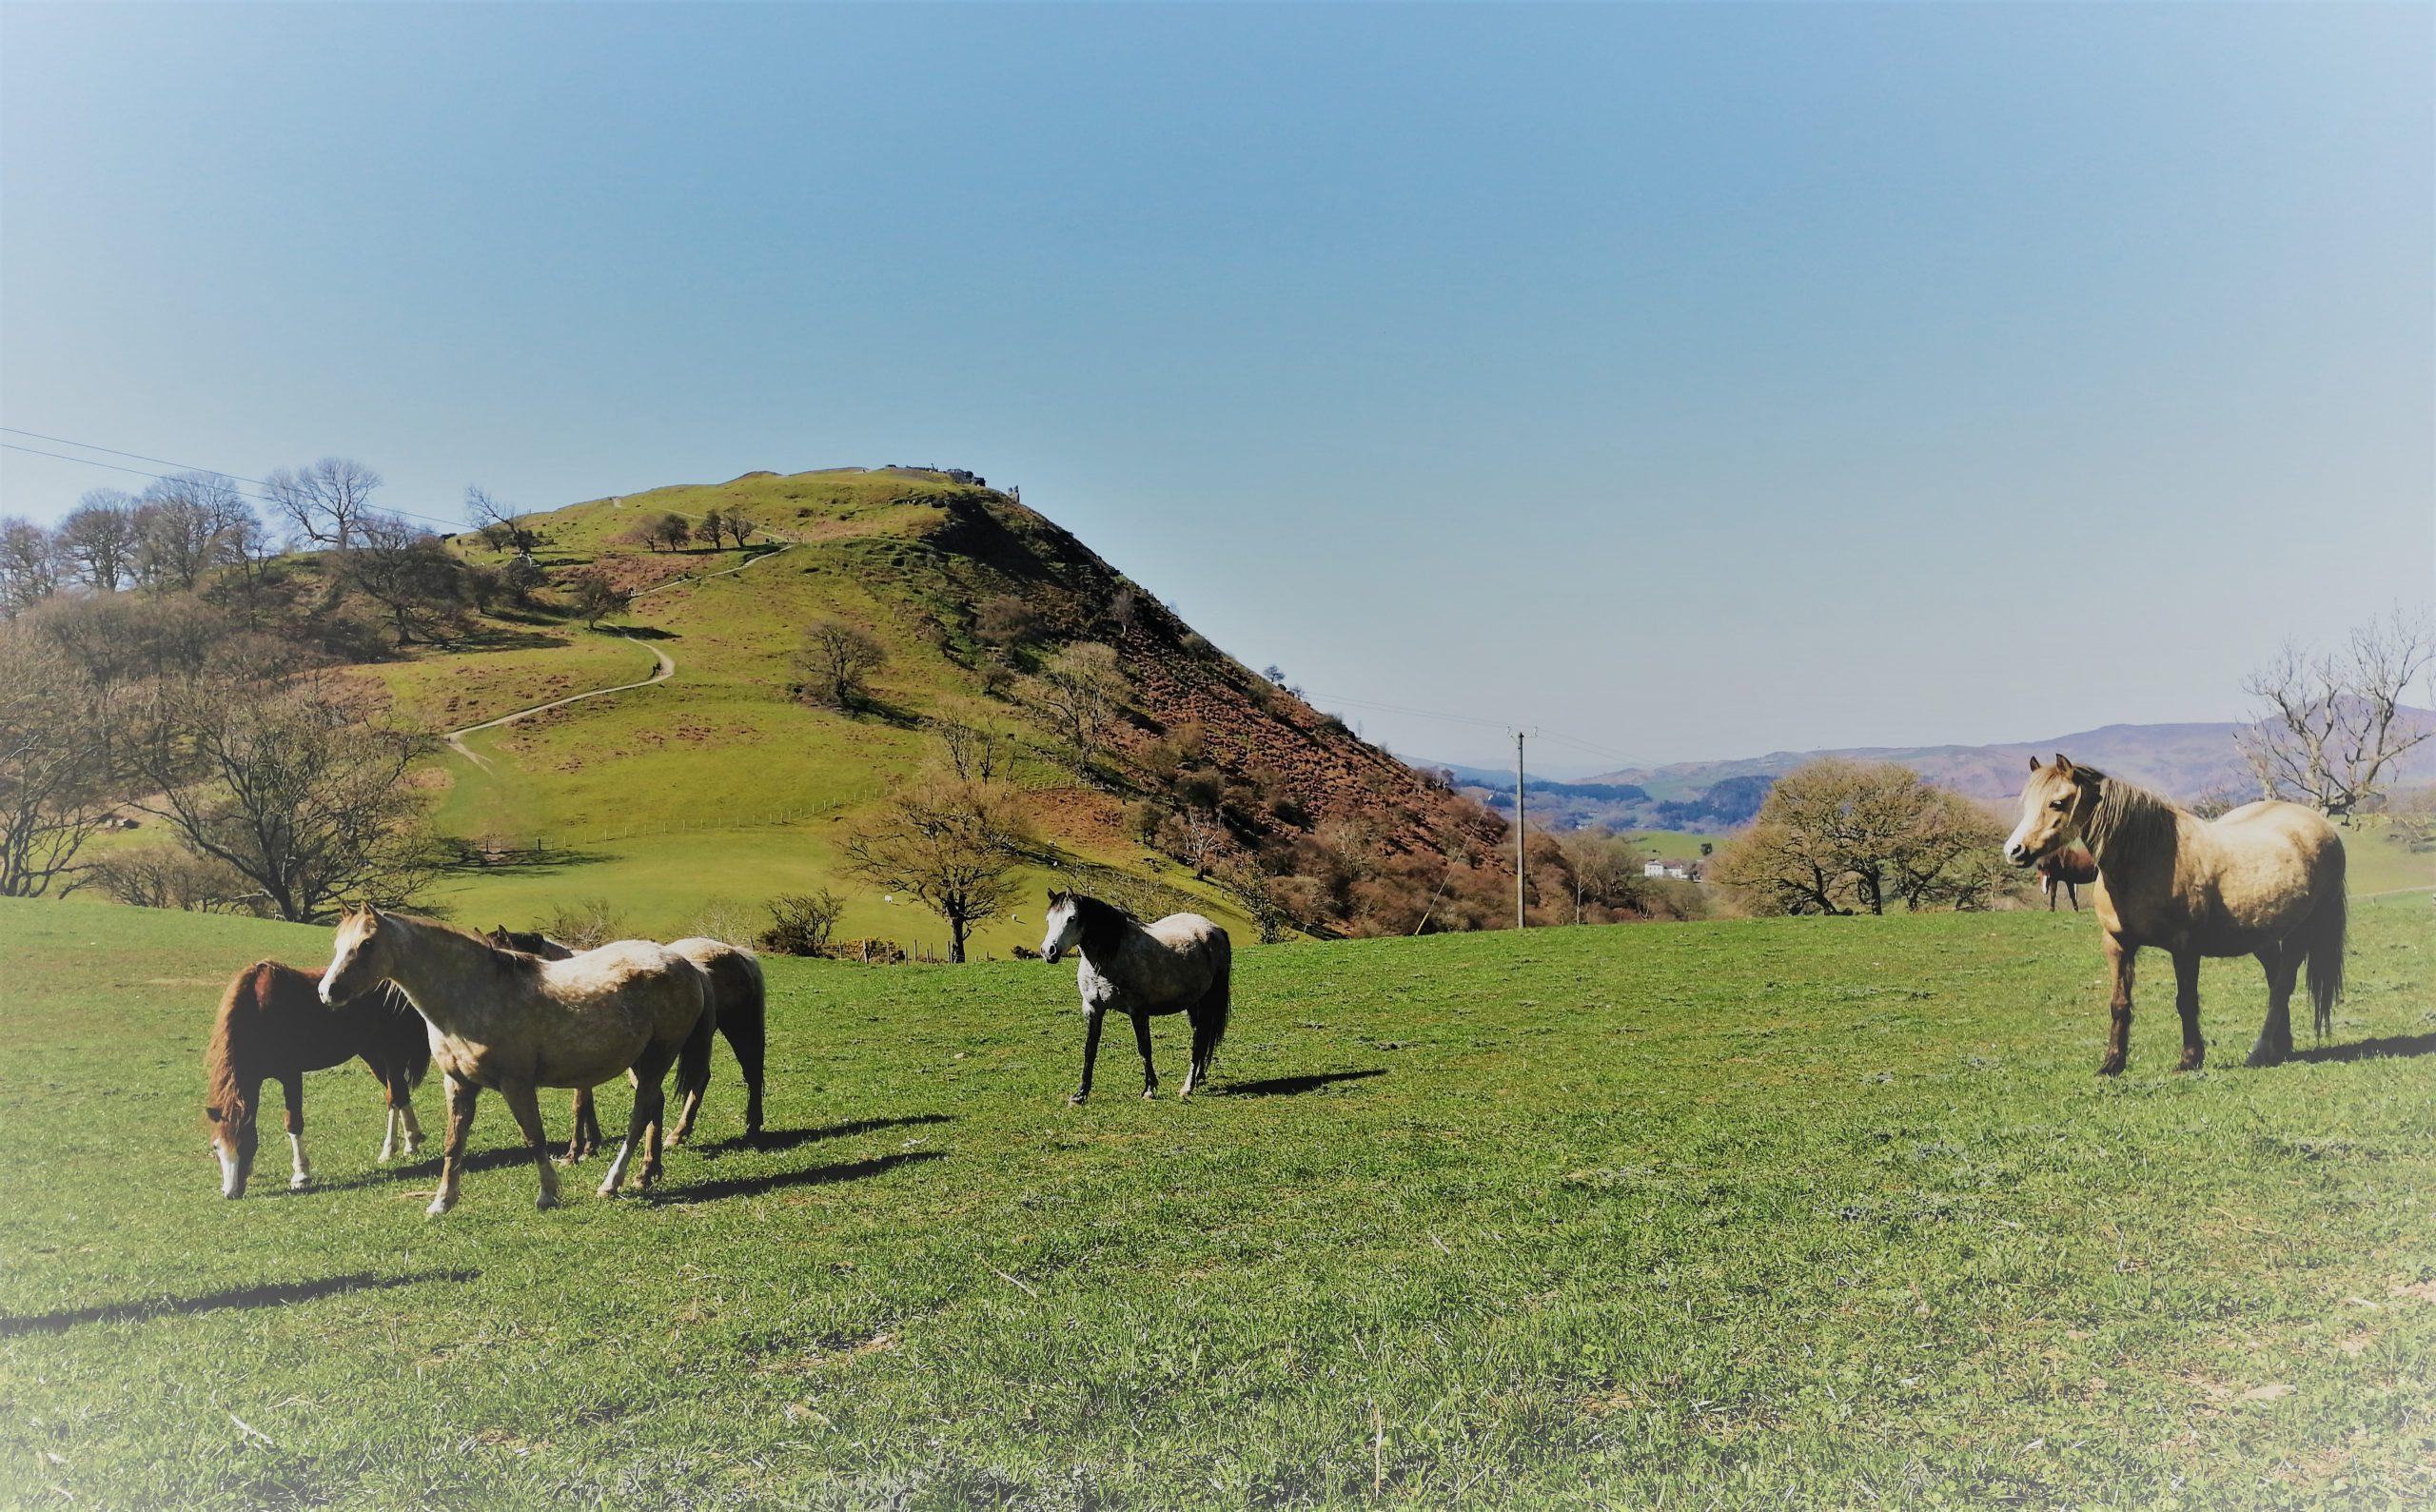 Welsh ponies enjoying the spring sun.